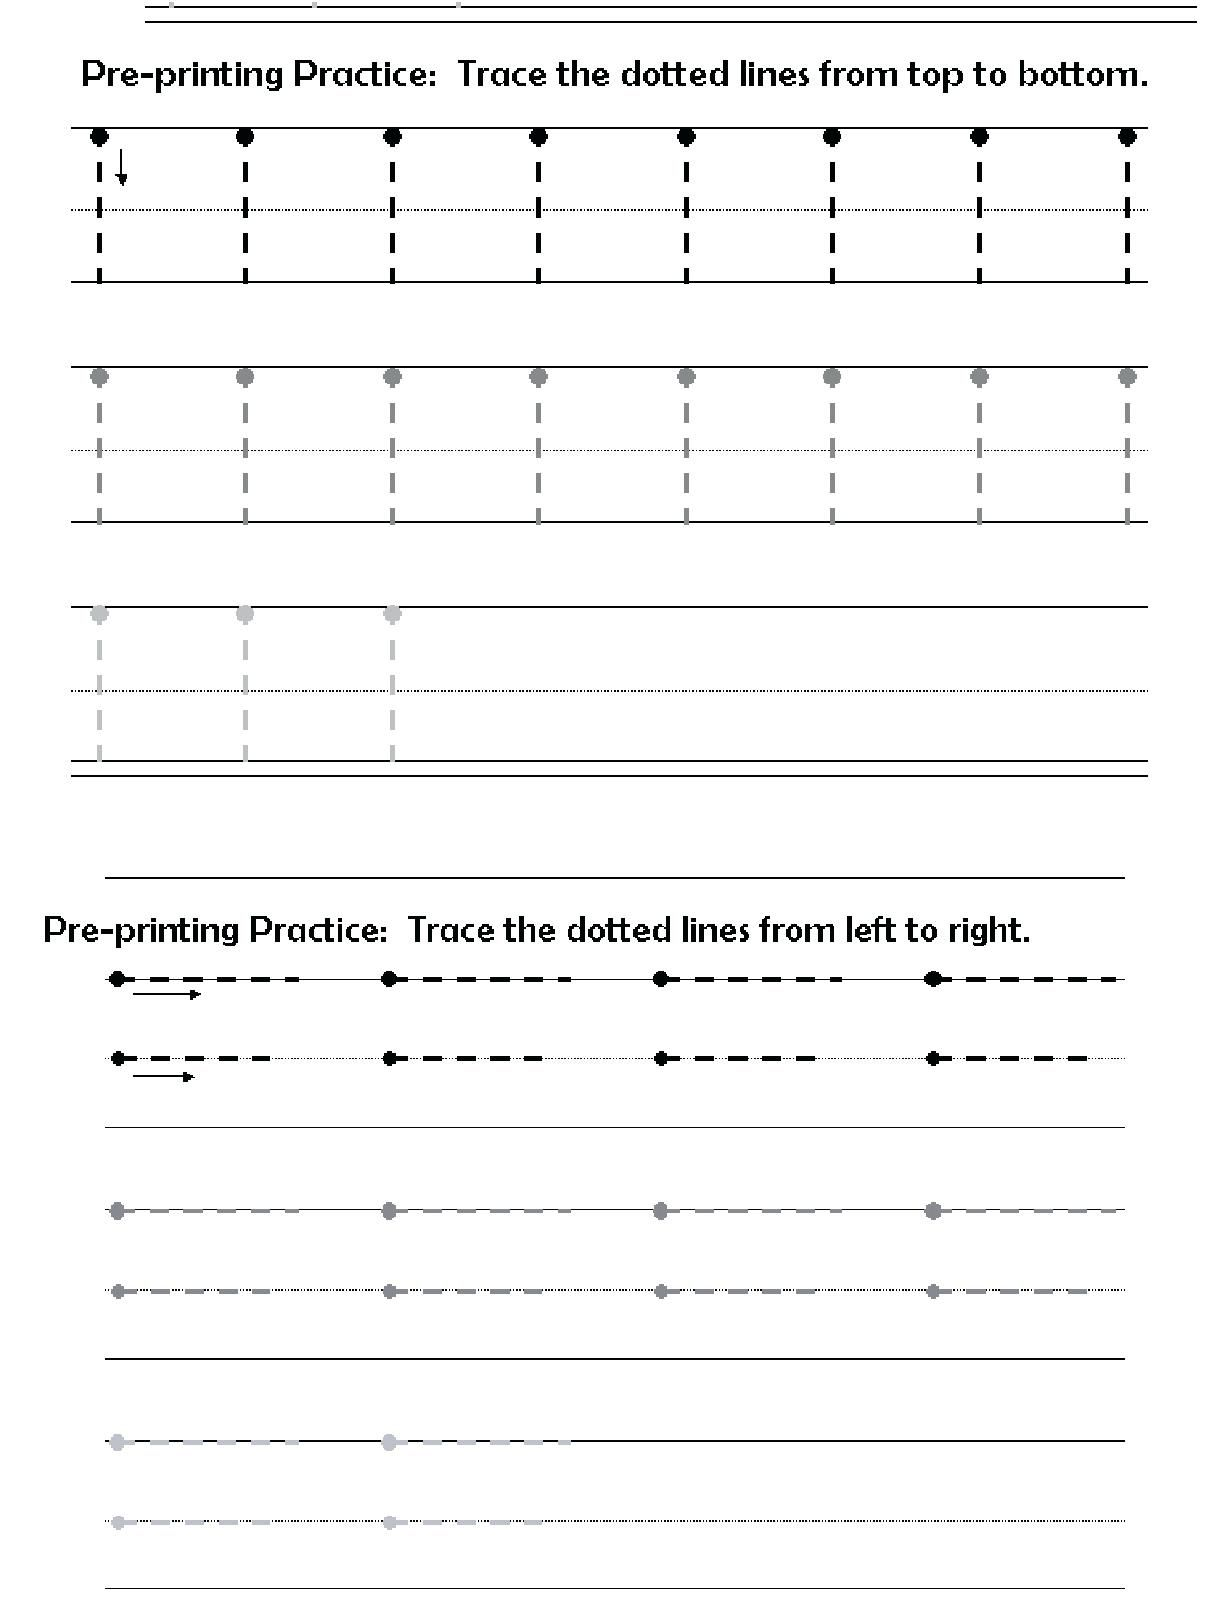 Number 1 Worksheets Site Pinterest Com For You Number 1 Worksheets Math F Free Preschool Worksheets Tracing Worksheets Preschool Preschool Number Worksheets [ 1600 x 1225 Pixel ]